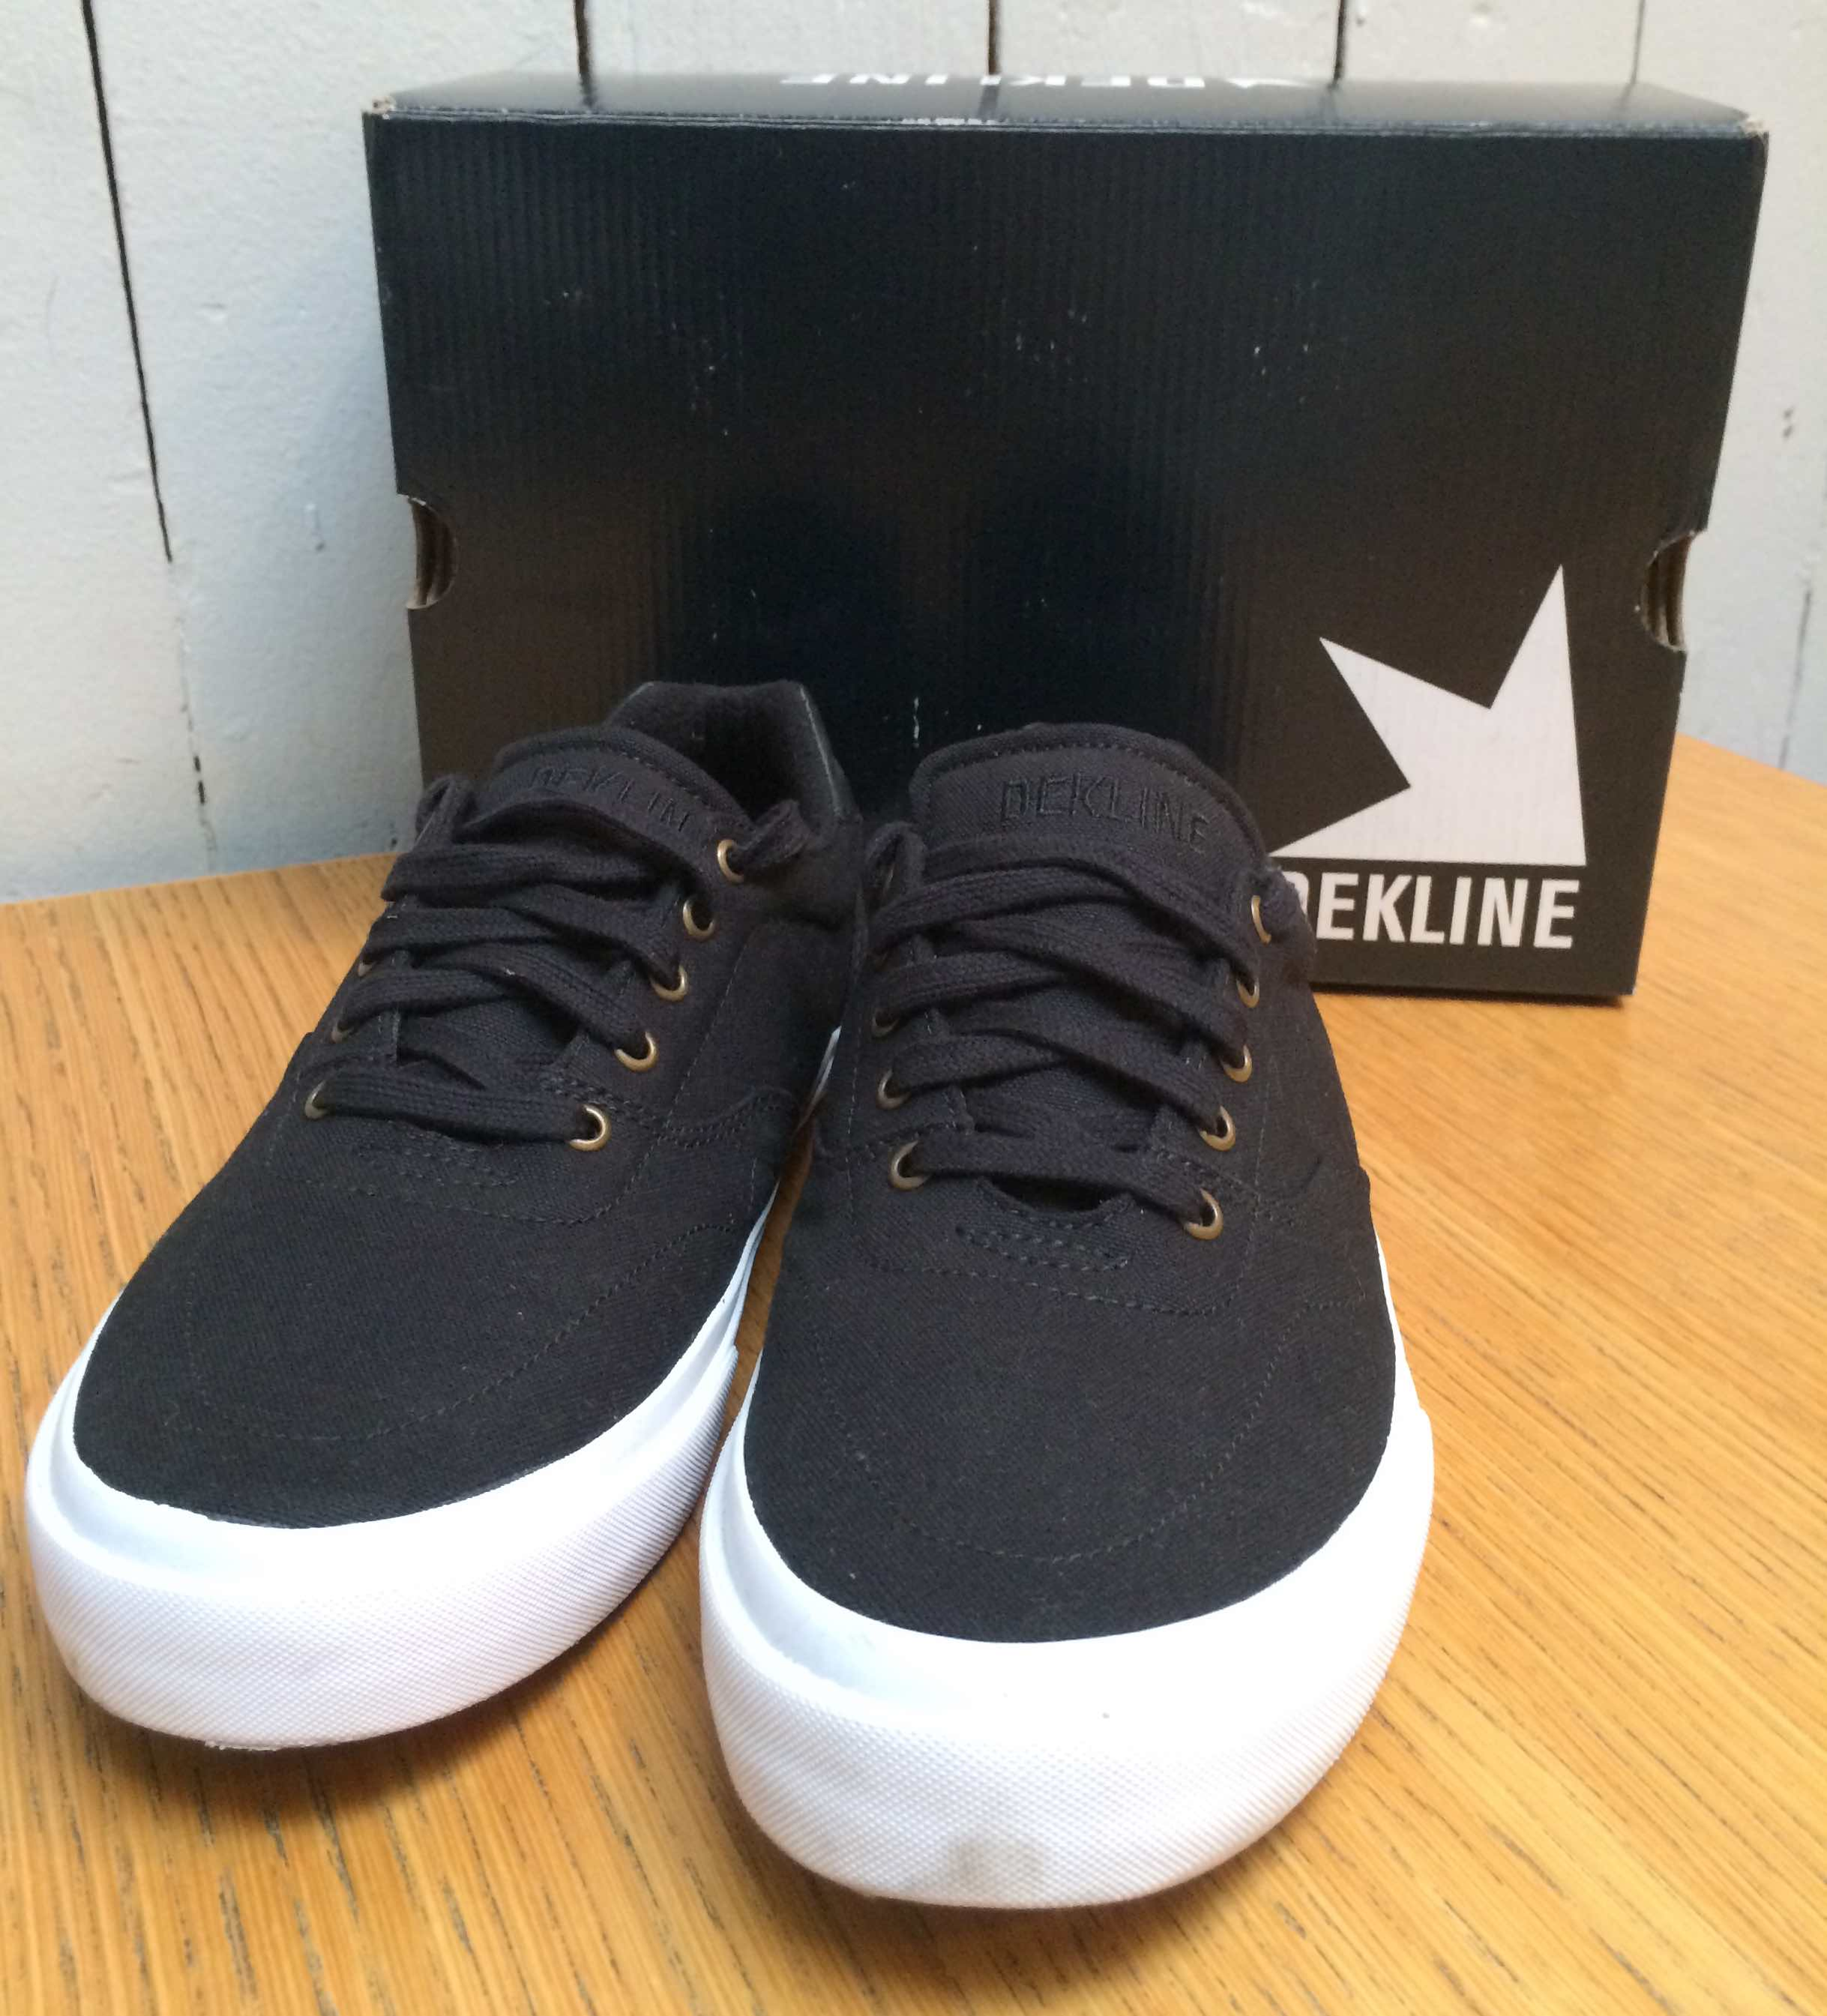 dekline Wayland vegan skateboard shoes